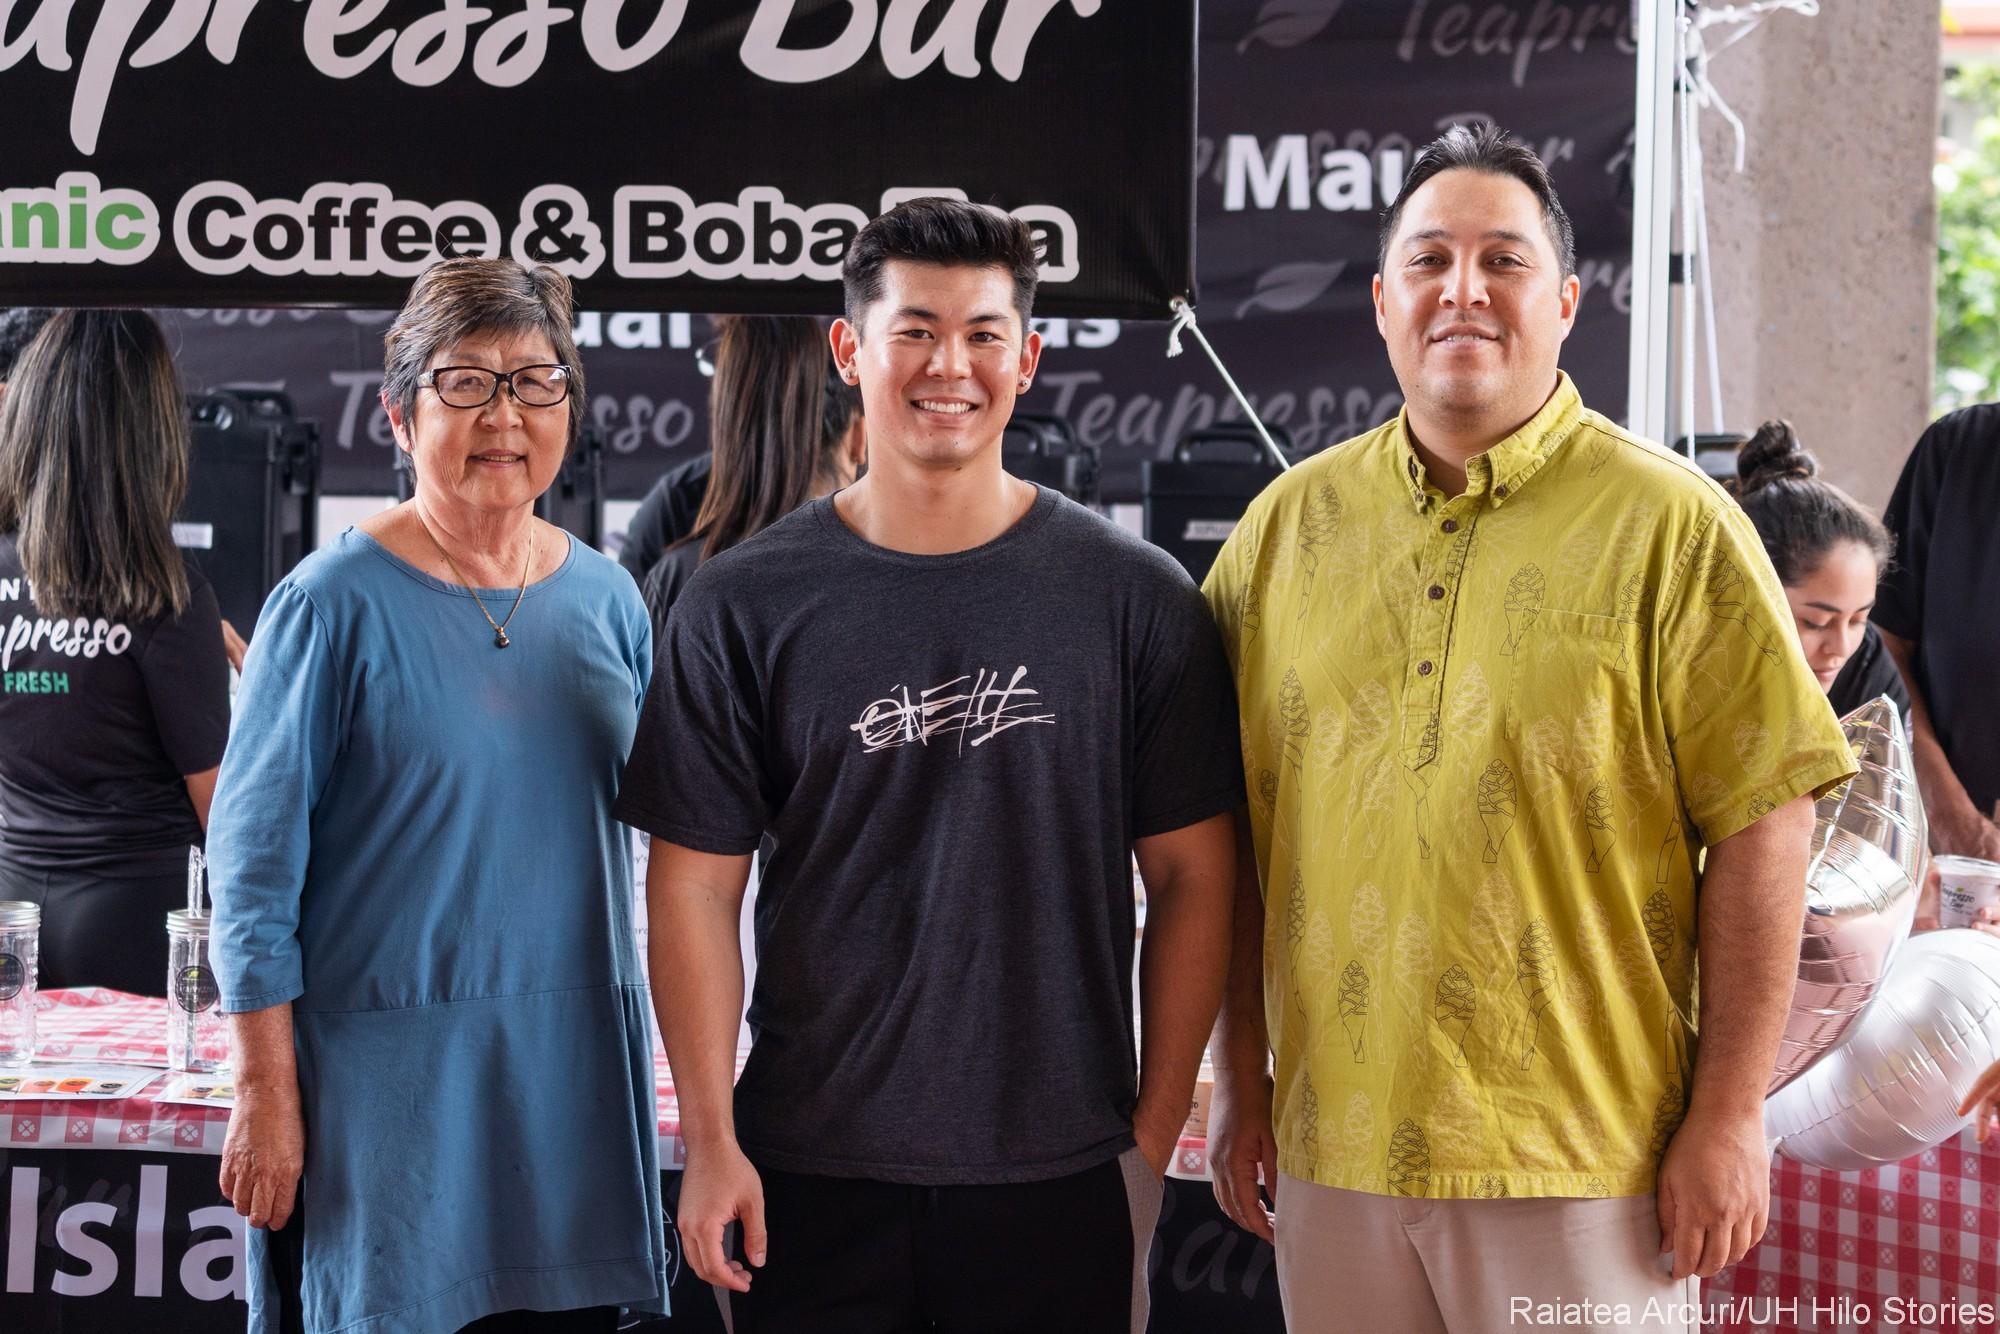 Marcia Sakai, Jordan Kumimura, Kalei Rapoza stand for photo in front of the concession.